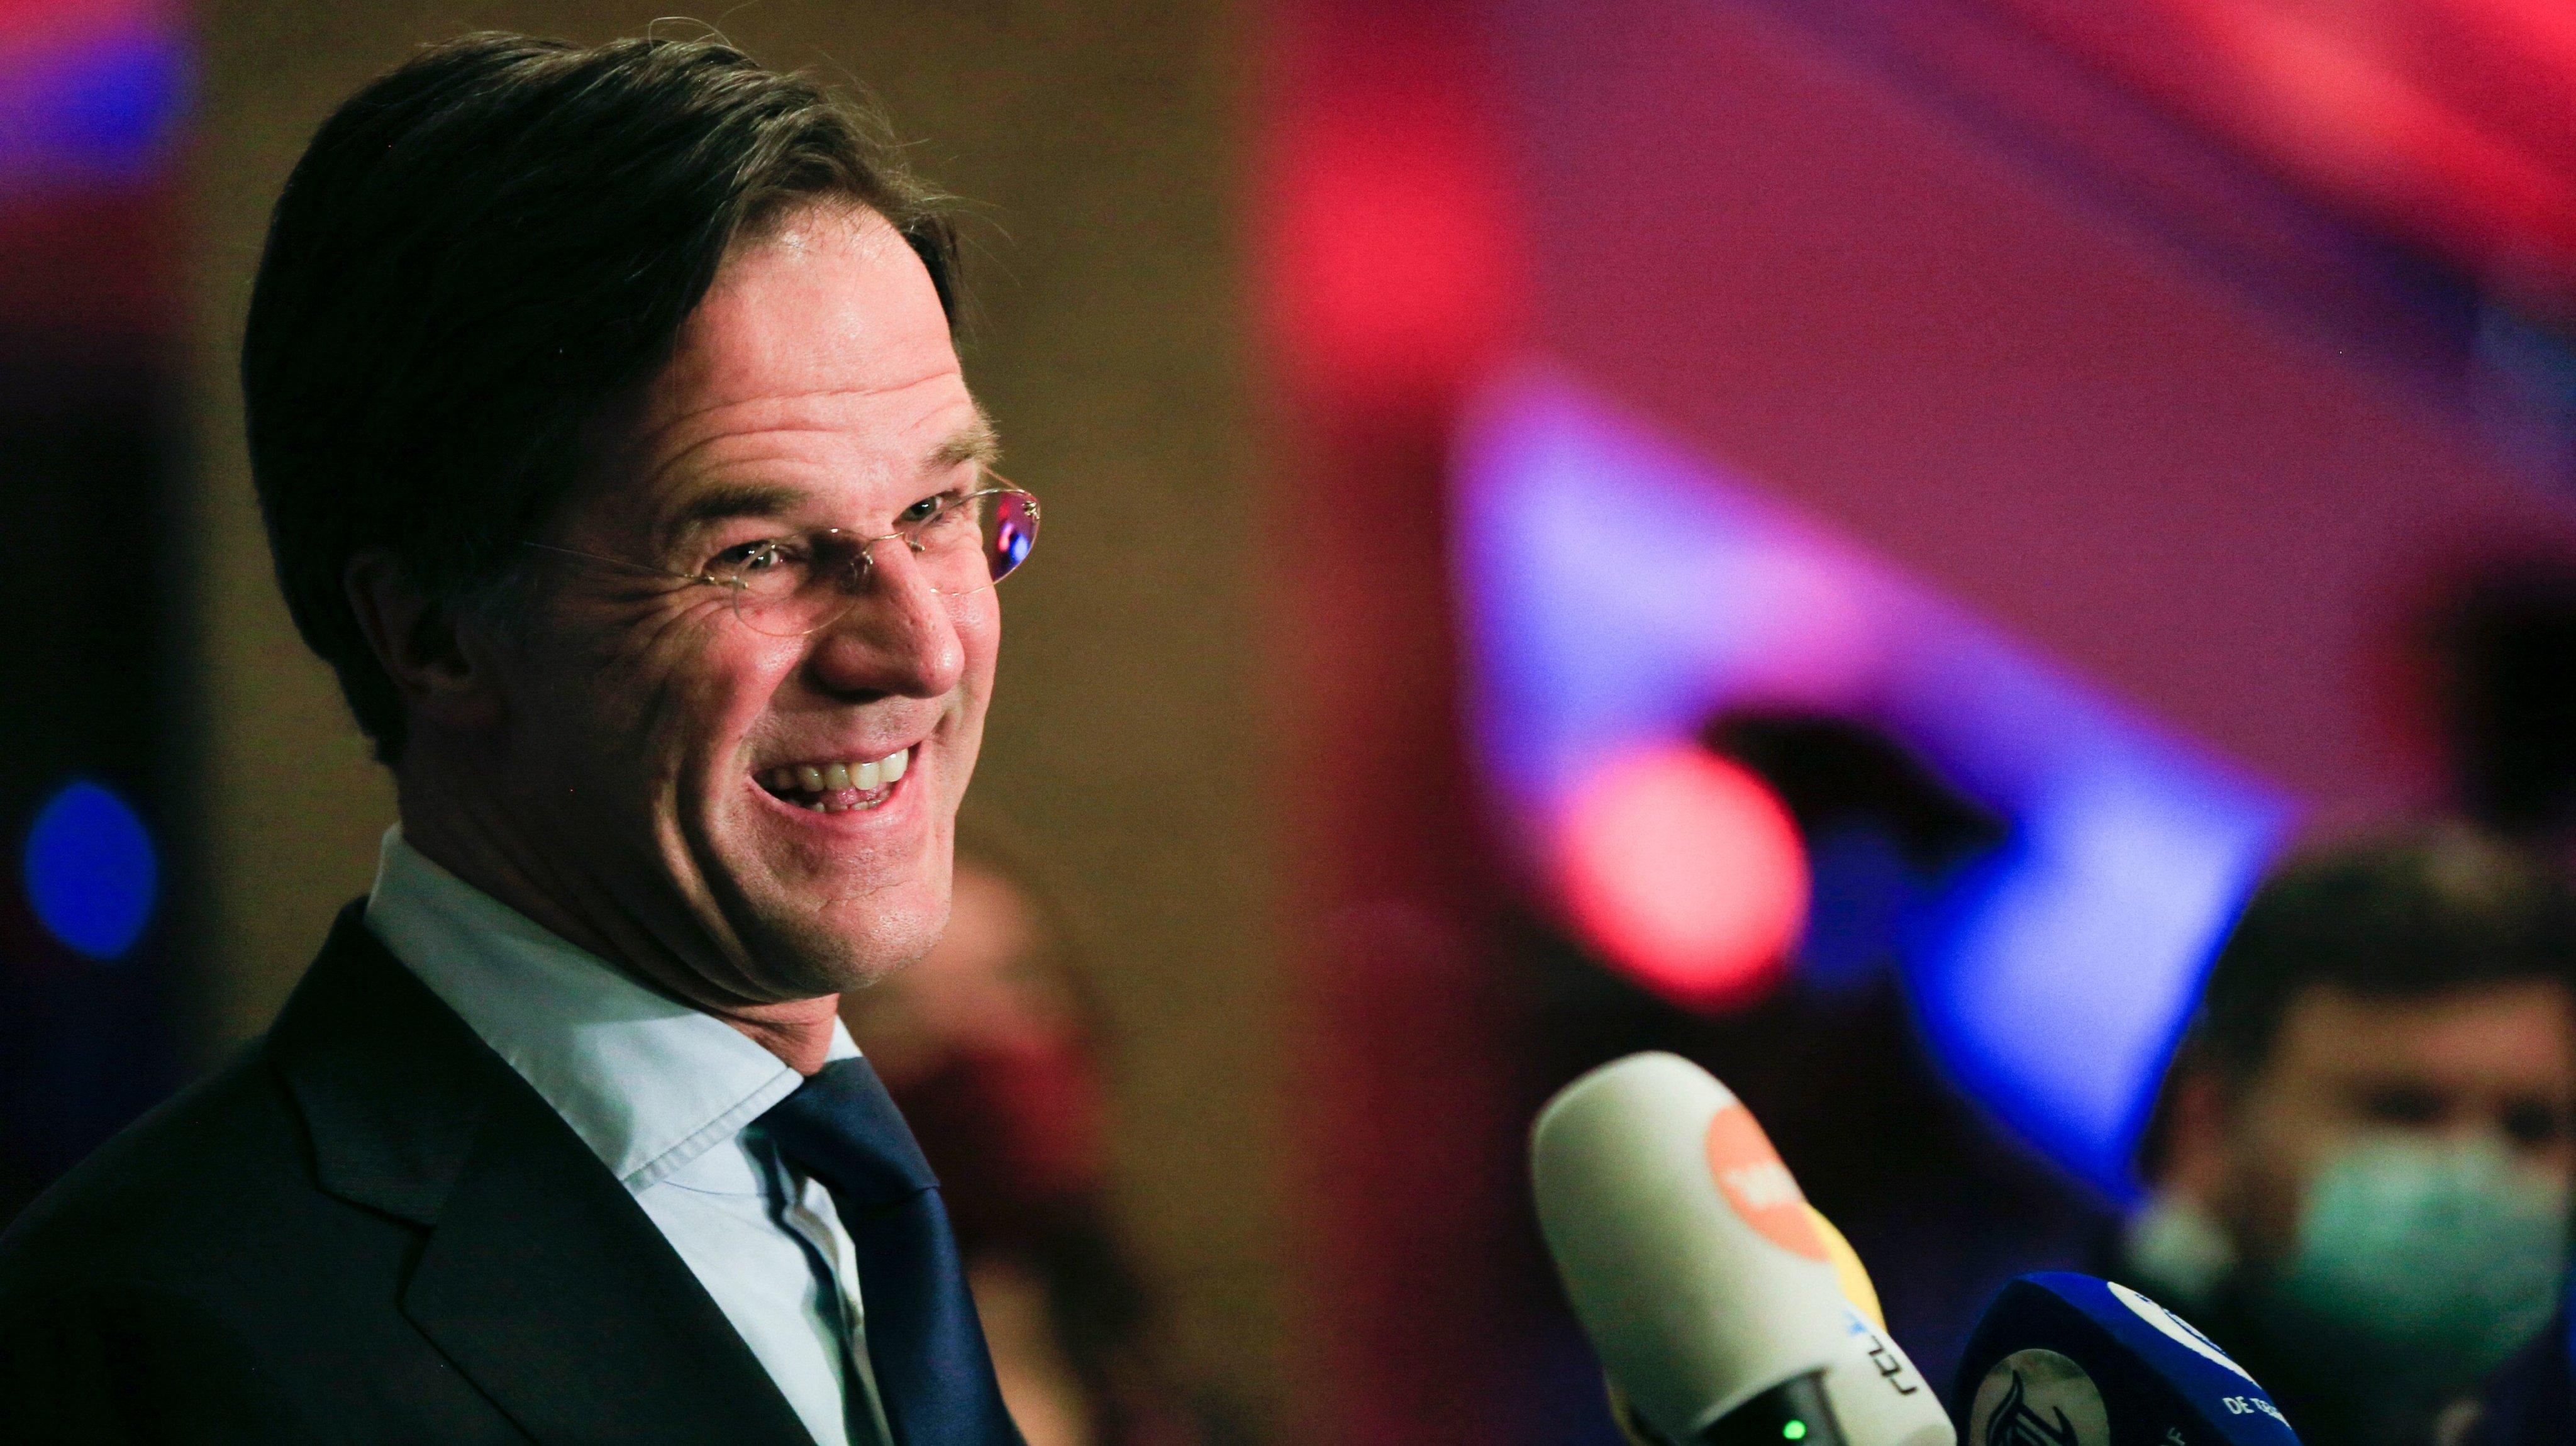 NETHERLANDS-POLITICS-VOTE